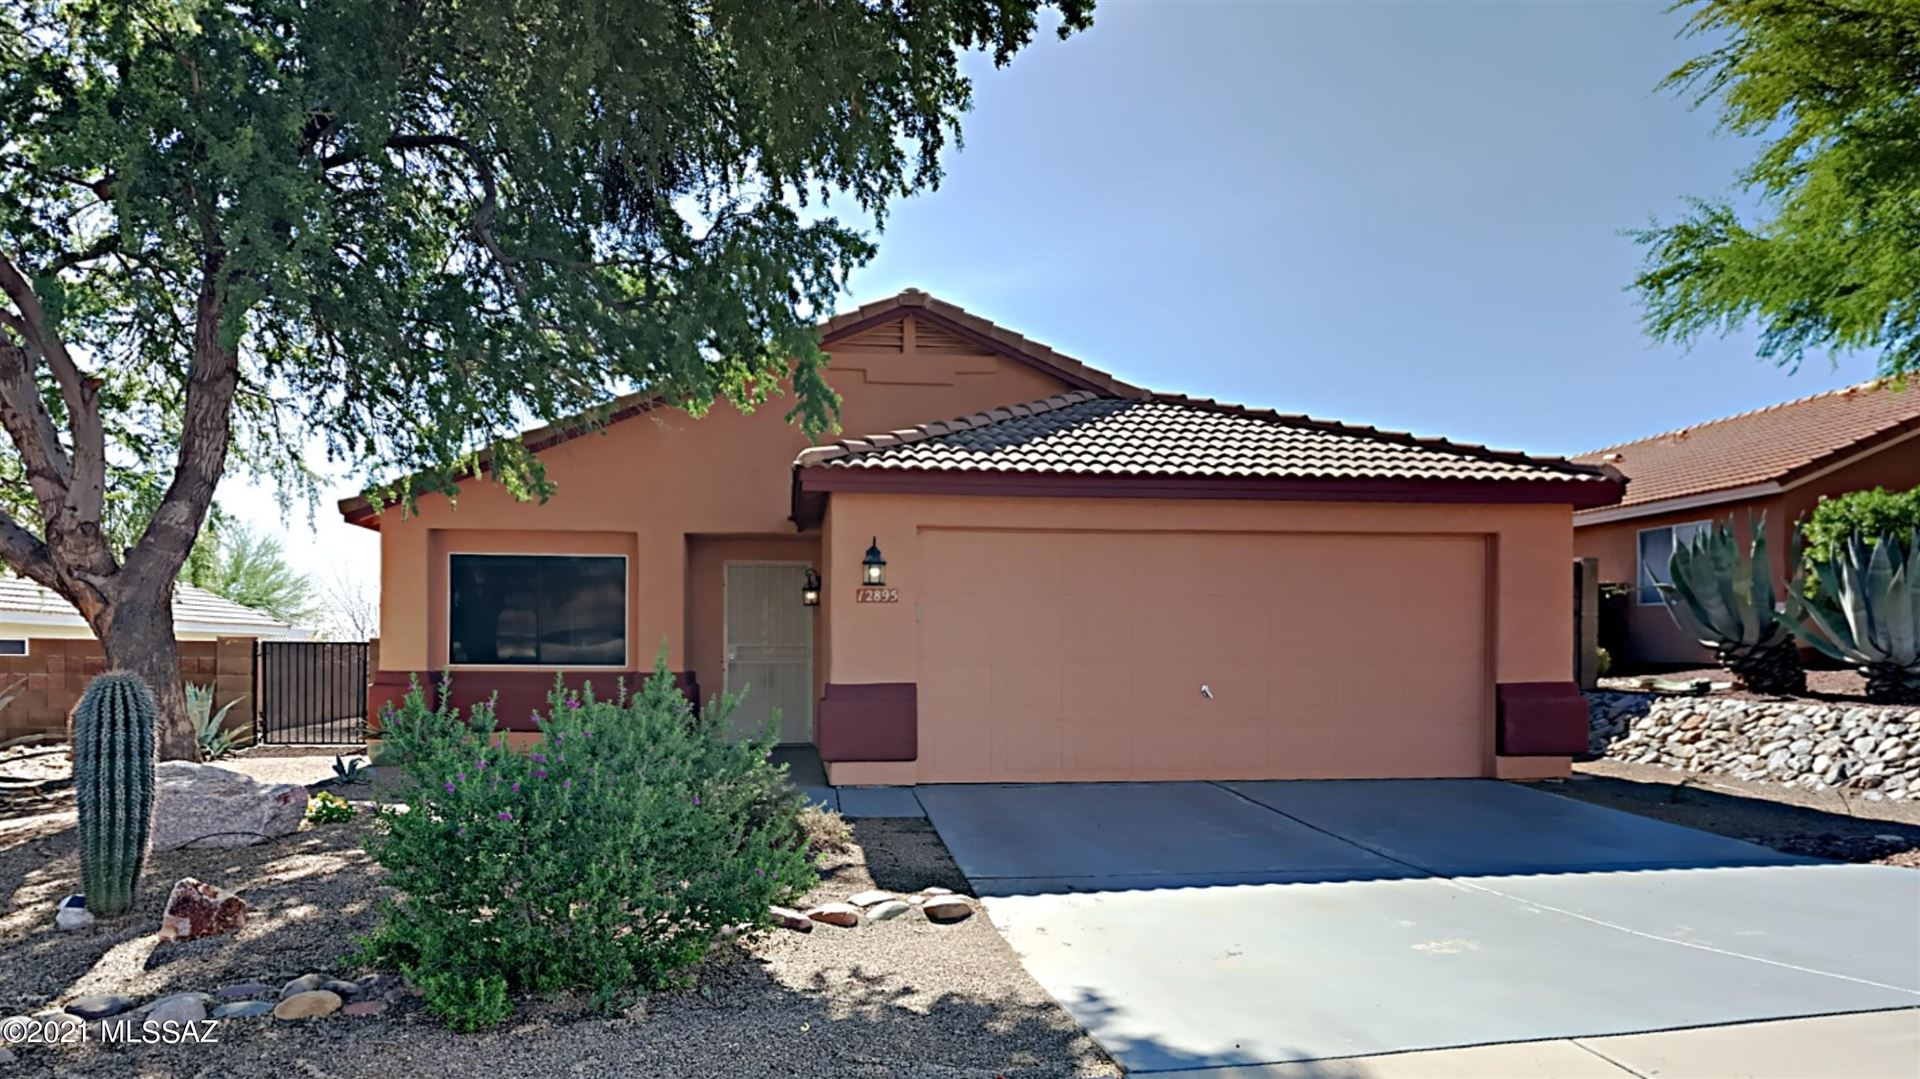 12895 N Suizo Mountains Road, Marana, AZ 85658 - MLS#: 22120690